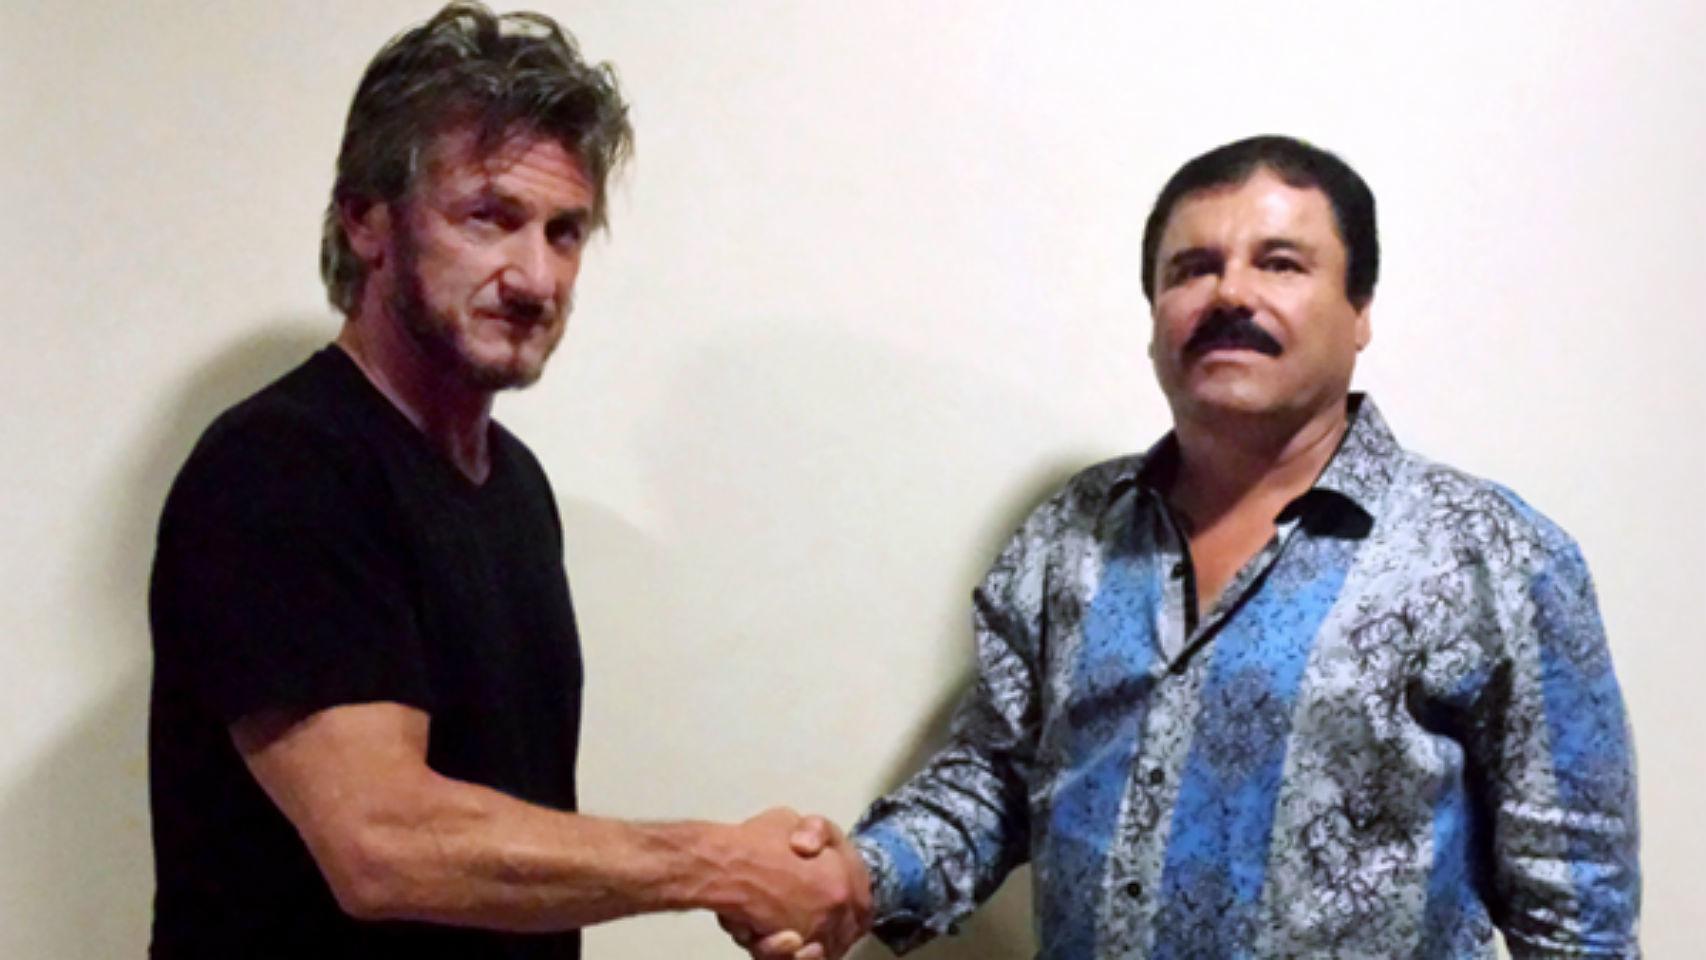 Sean Penn se reunió en secreto con 'El Chapo' Guzmán para entrevistarle